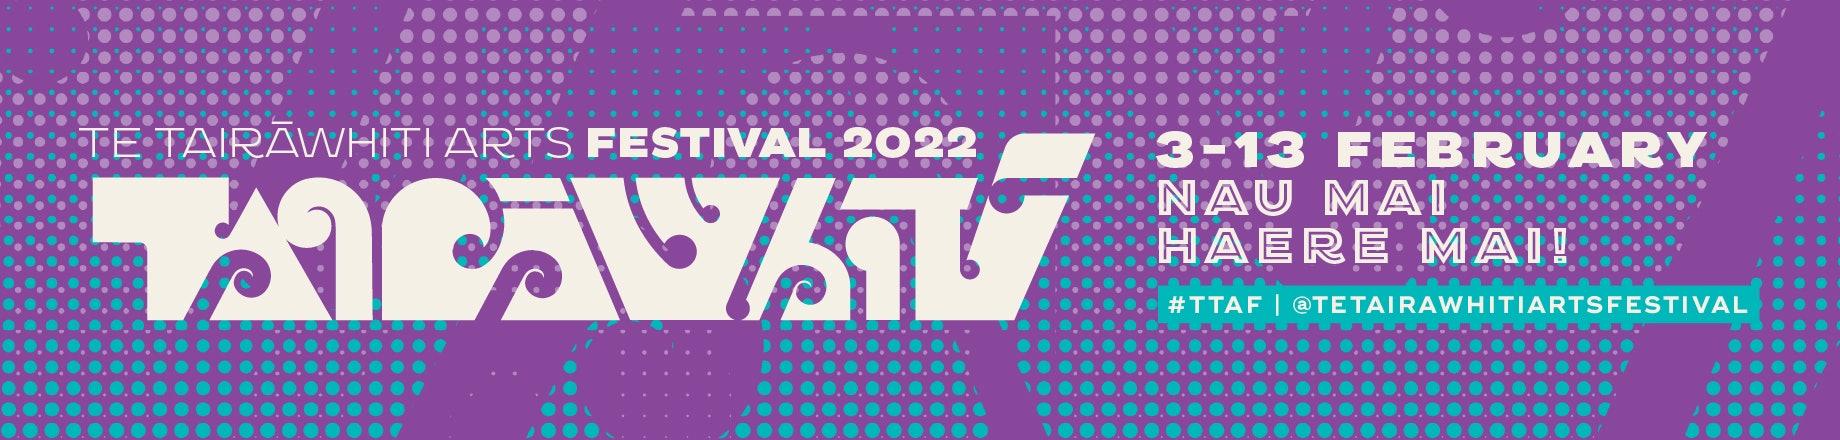 Te Tairāwhiti Arts Festival